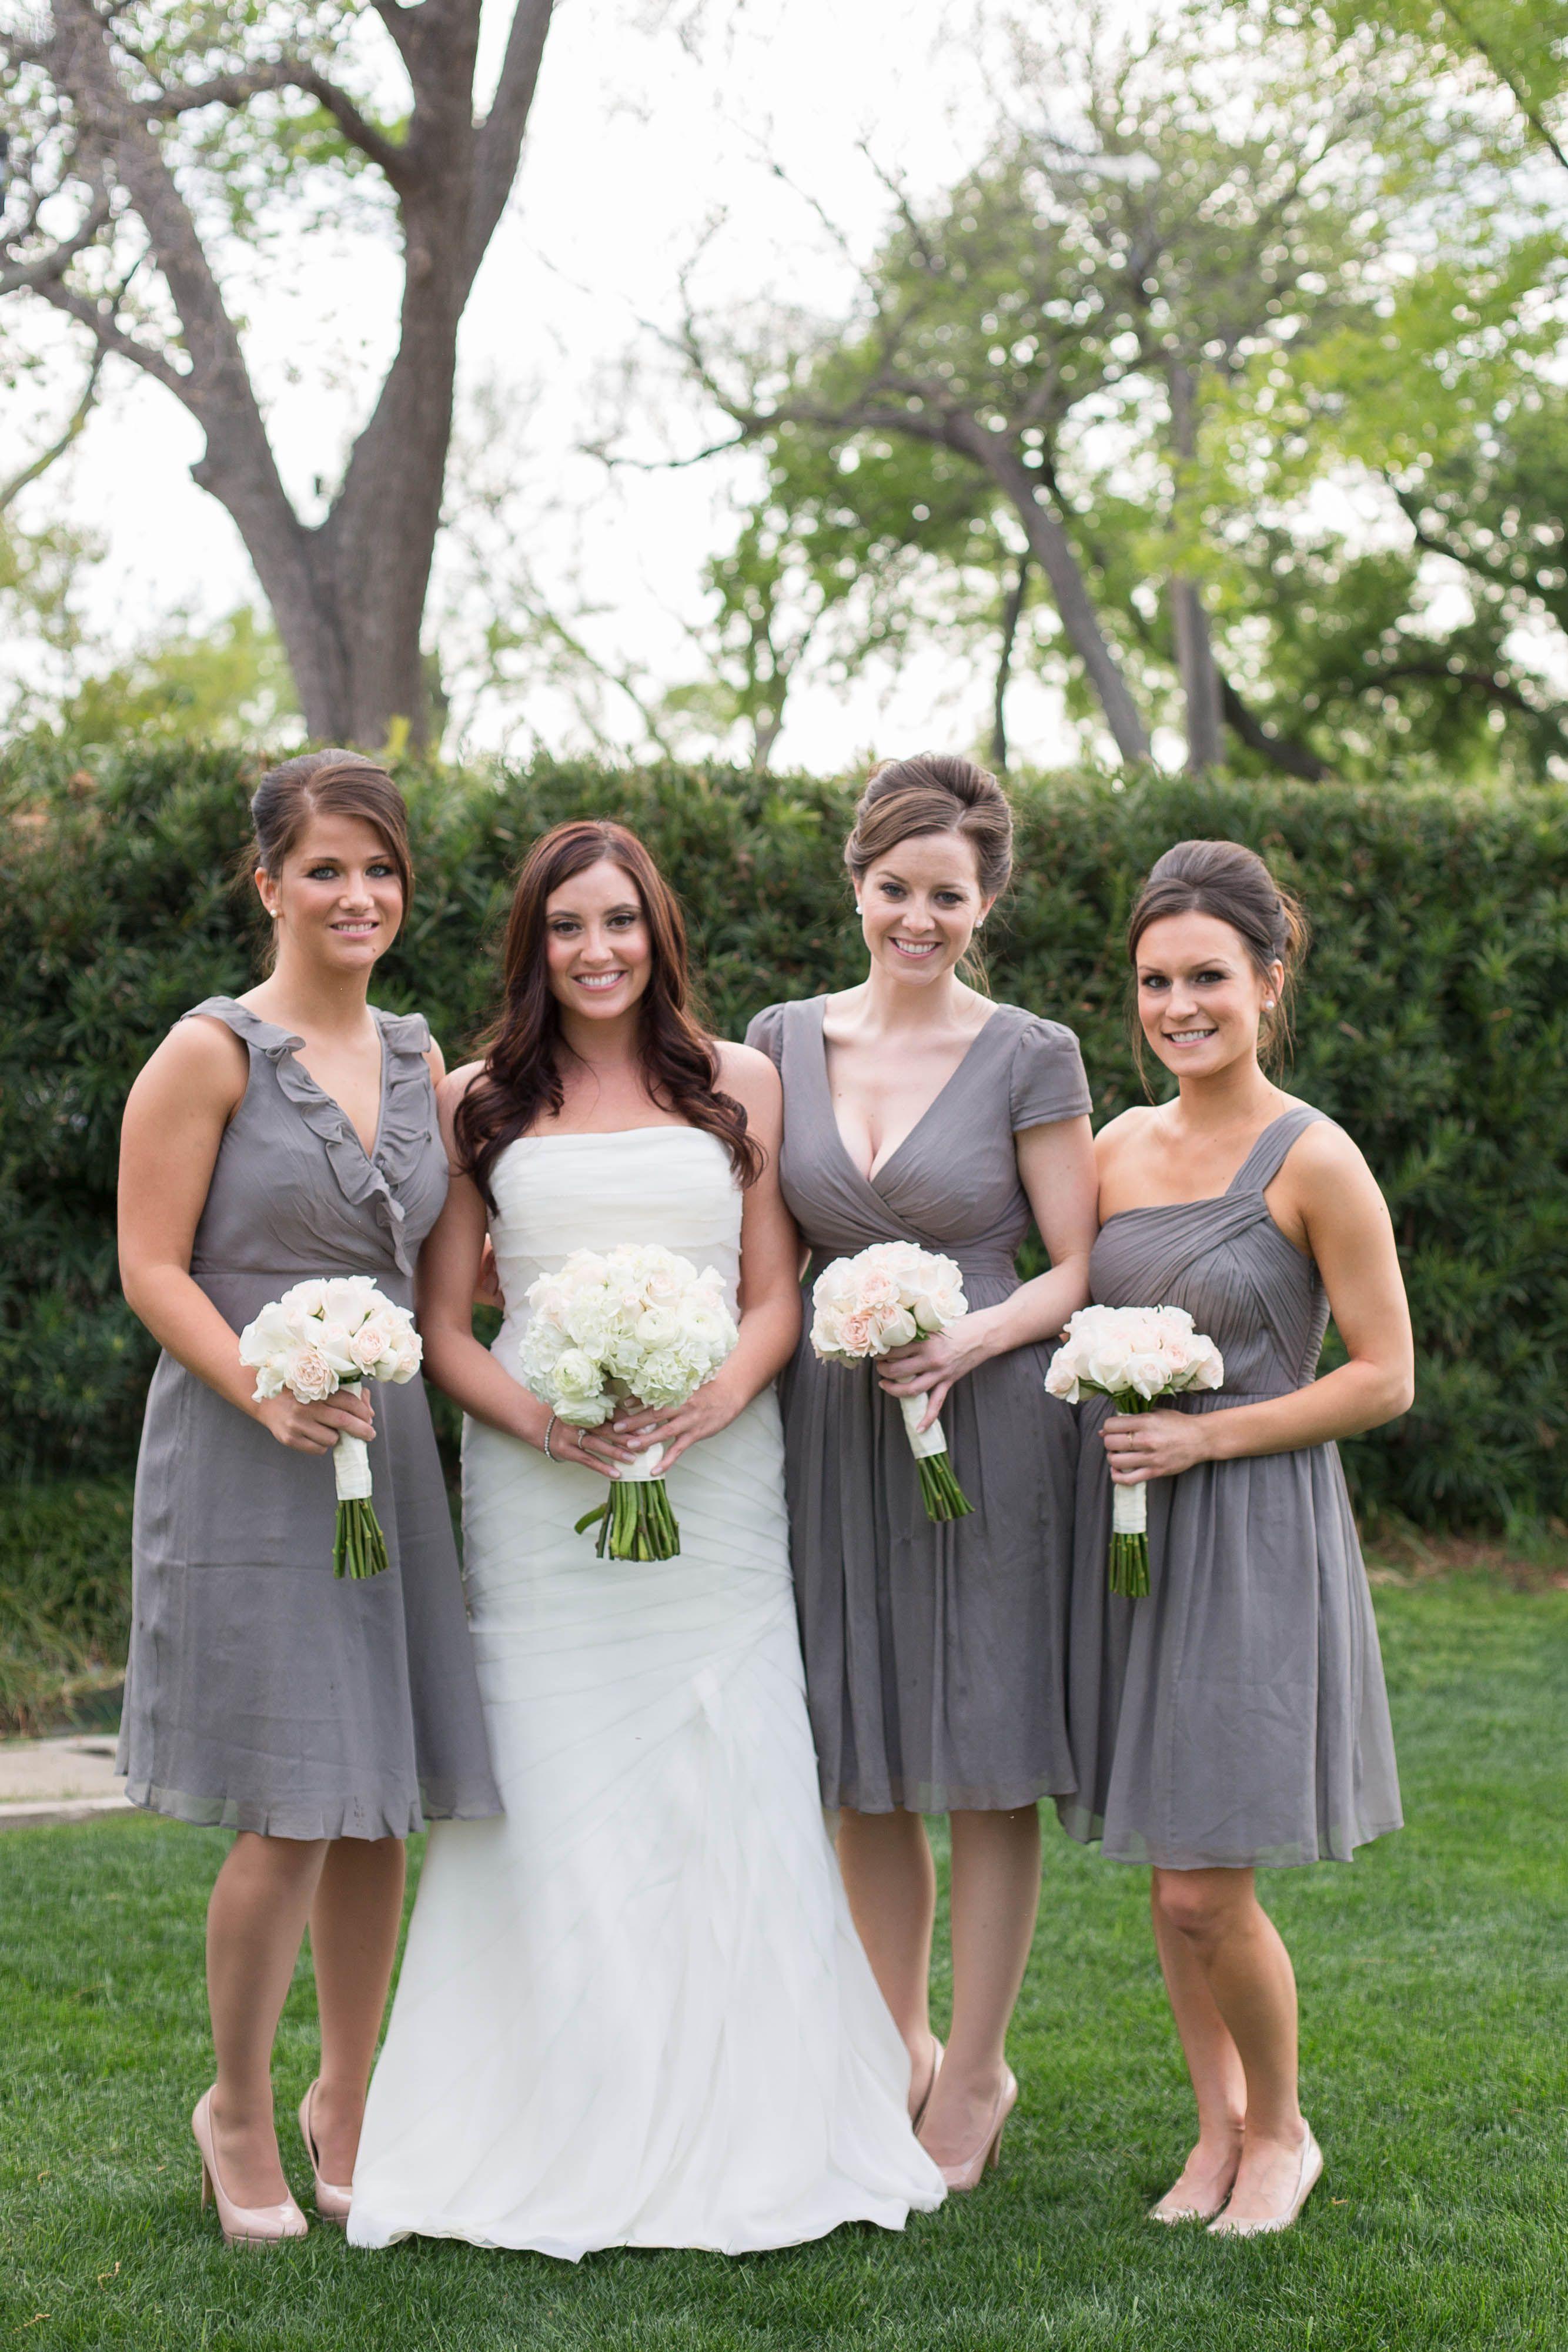 Gray bridesmaid dresses jew graphite different styles same gray bridesmaid dresses jew graphite different styles same color ombrellifo Gallery